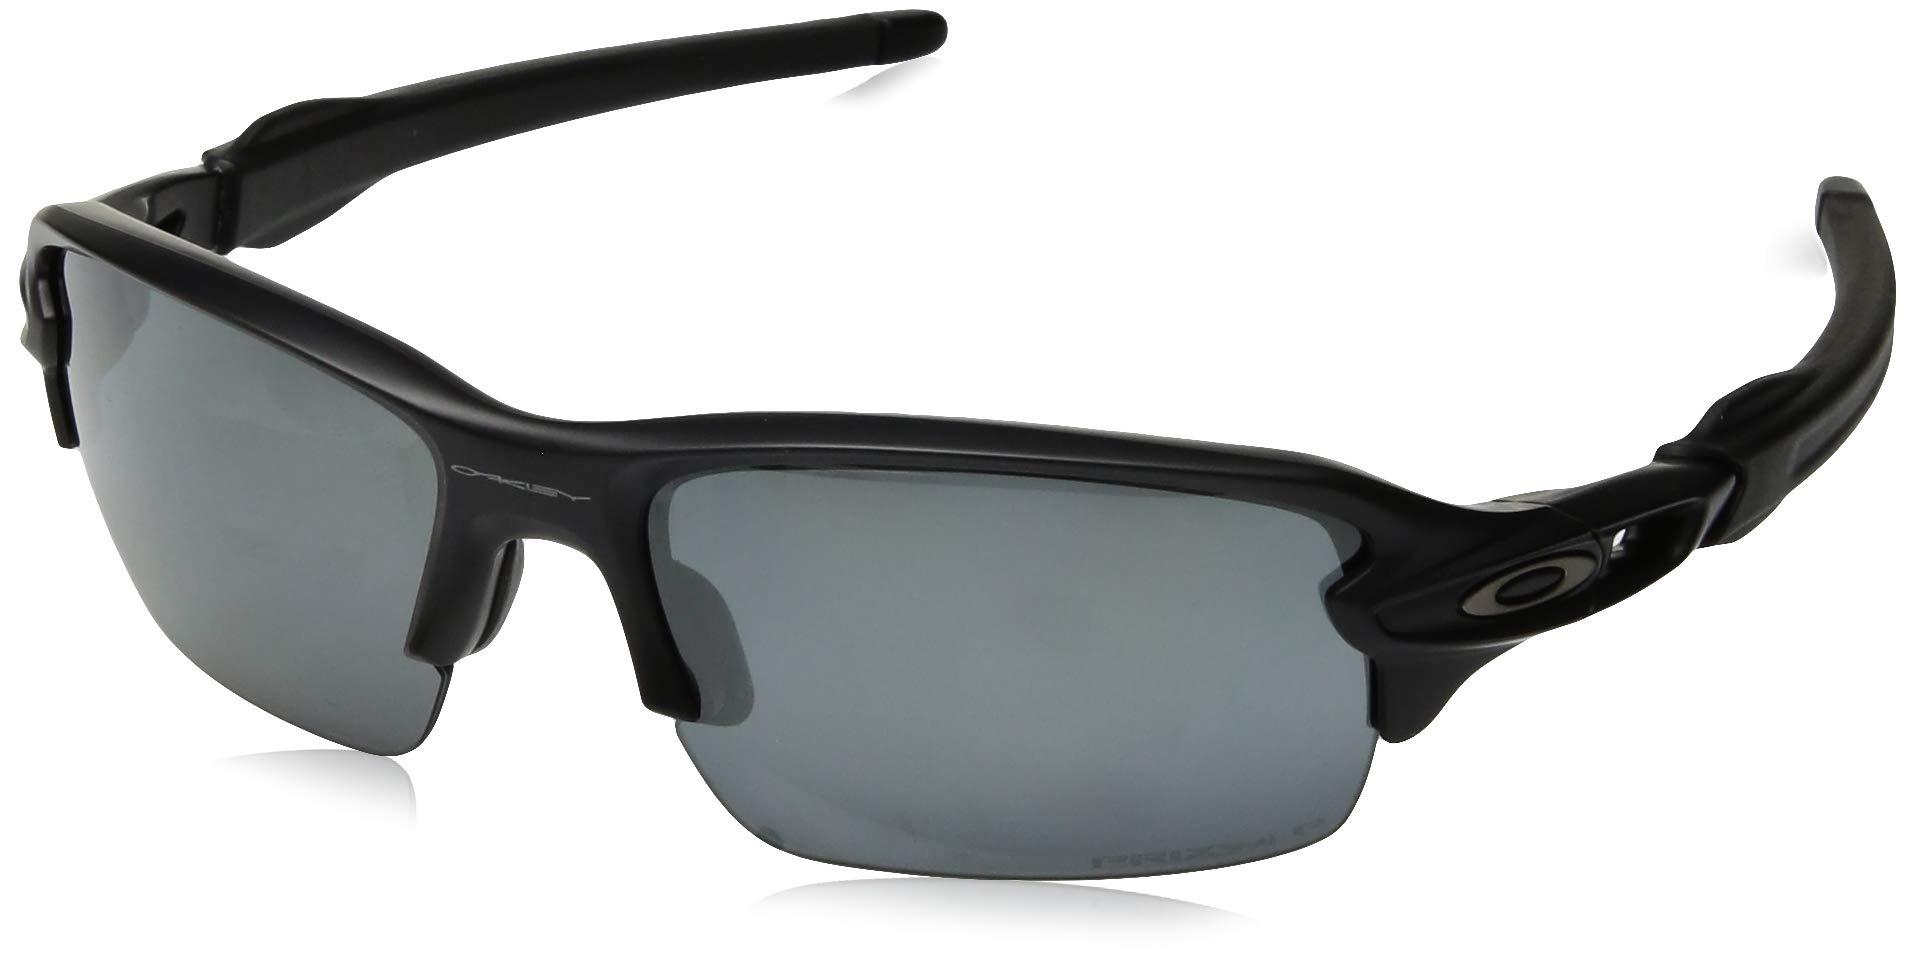 Oakley Boys' Flak Xs Polarized Iridium Rectangular Sunglasses MATTE BLACK 59.0 mm